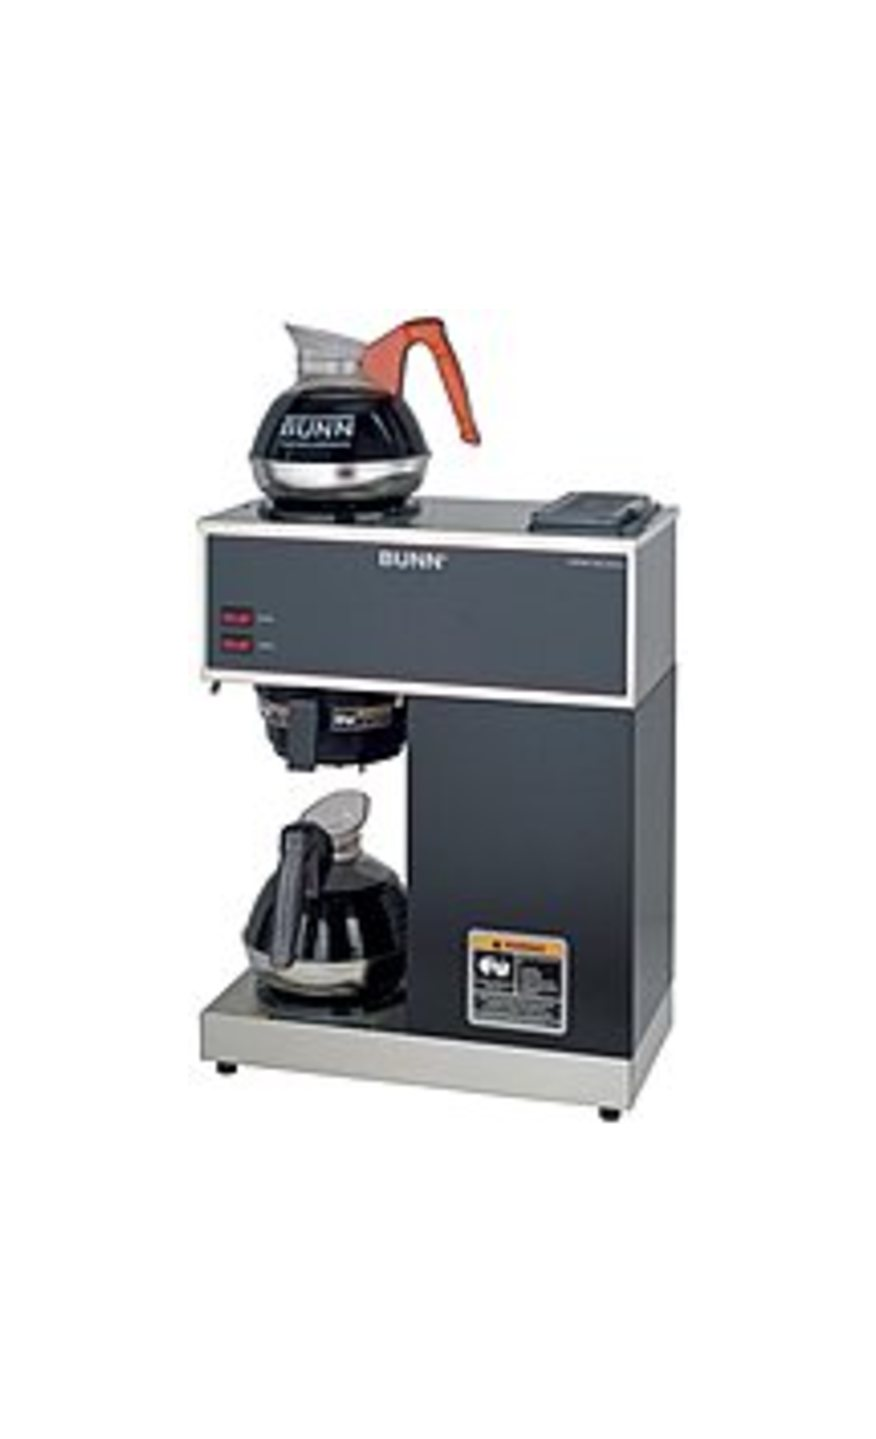 BUNN VPR 12-Cup Coffeemaker Black/Stainless-Steel 33200.0002